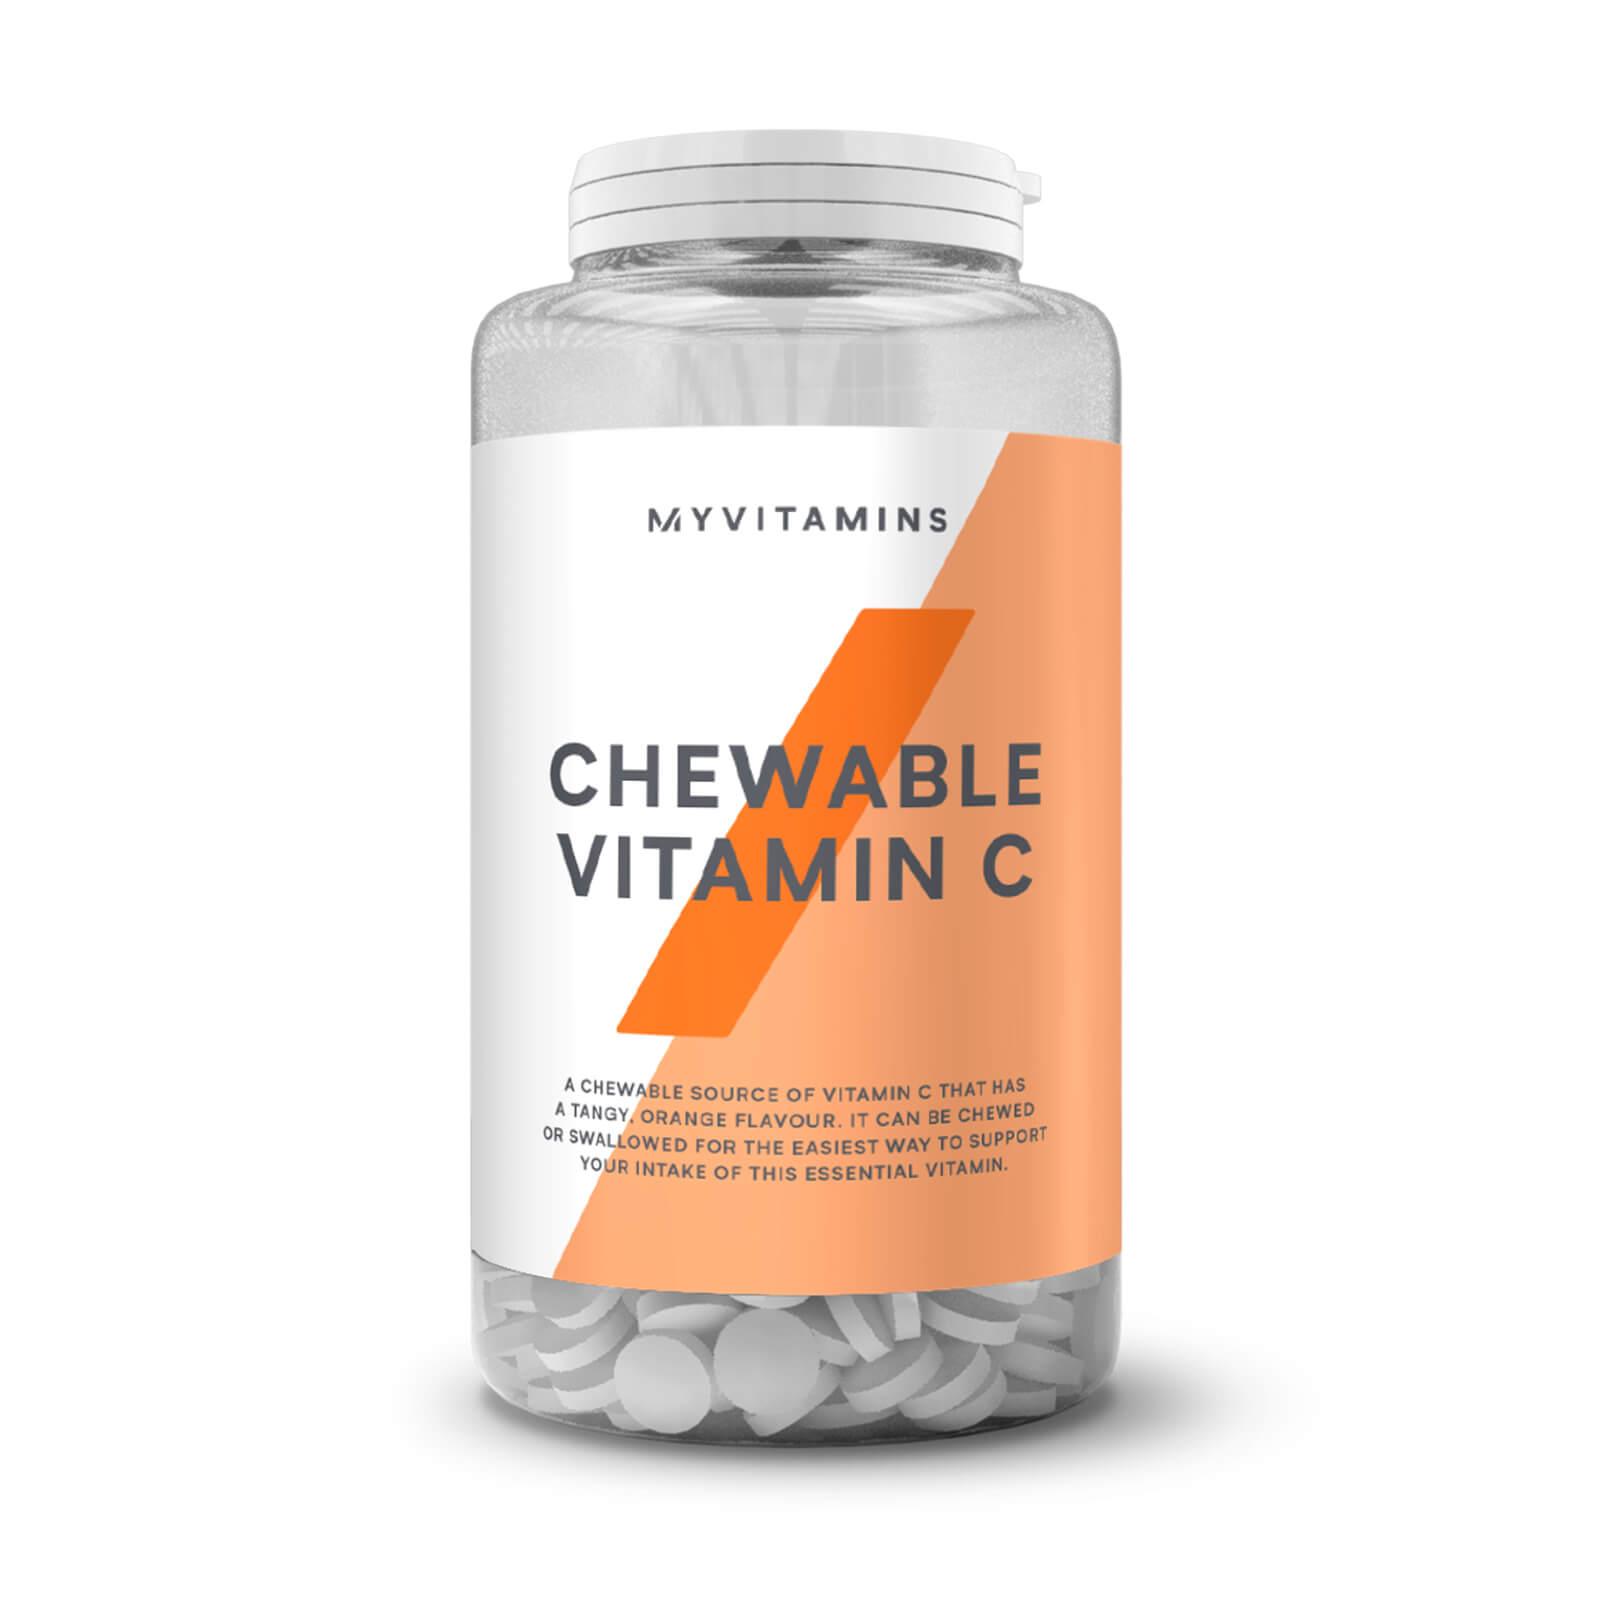 Myvitamins Chewable Vitamin C - 60Tablets